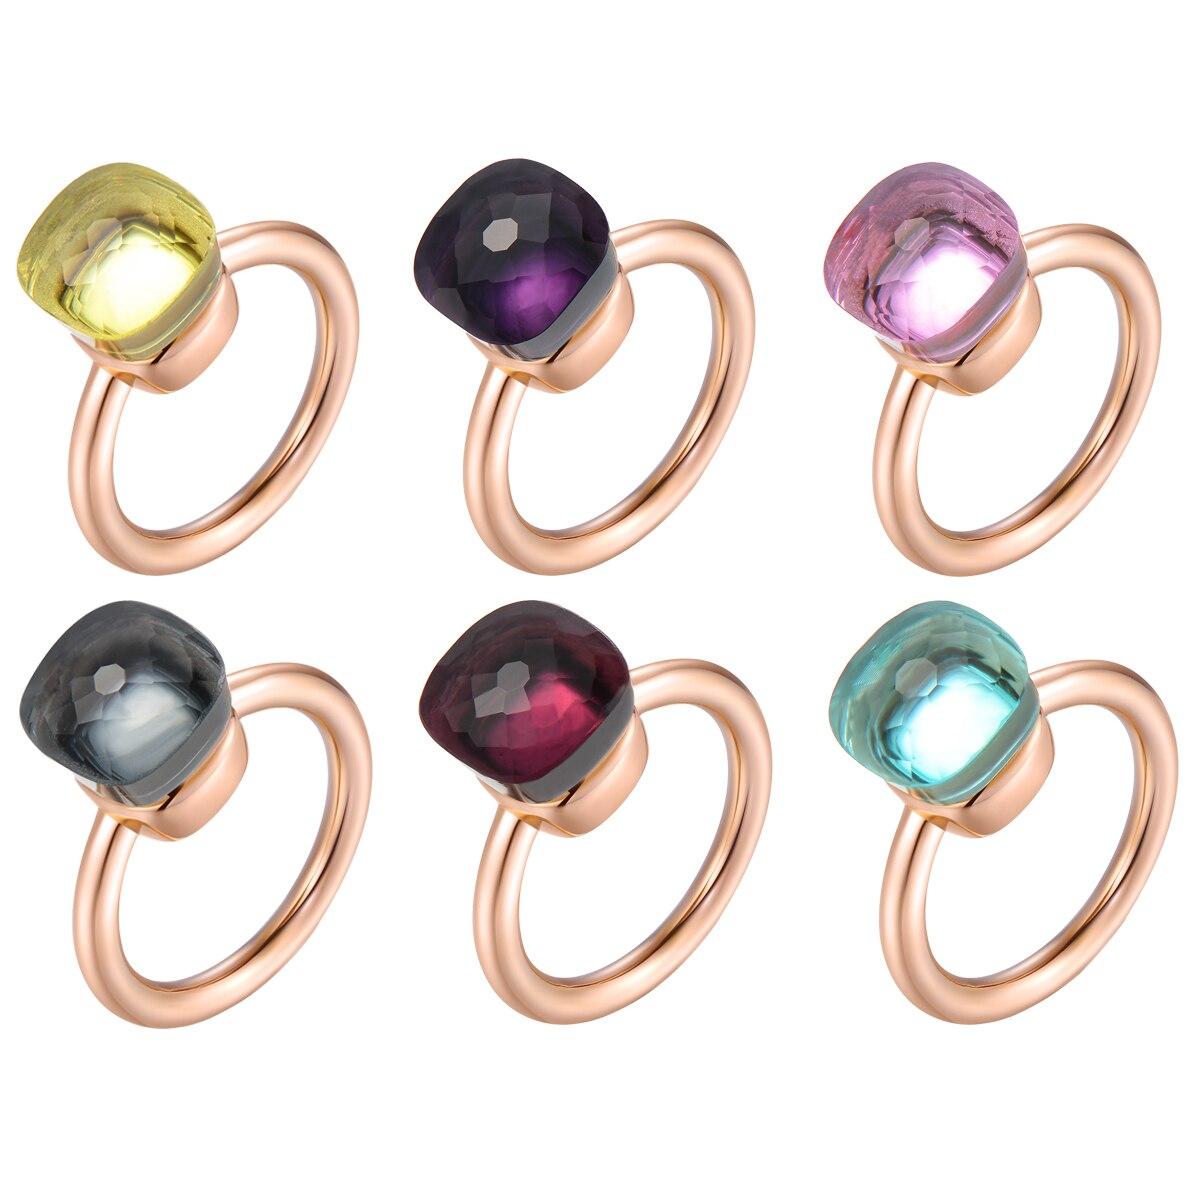 MetJakt Rose Gold Crystal Ring Solid 925 Sterling Silver Wedding Rings for Women